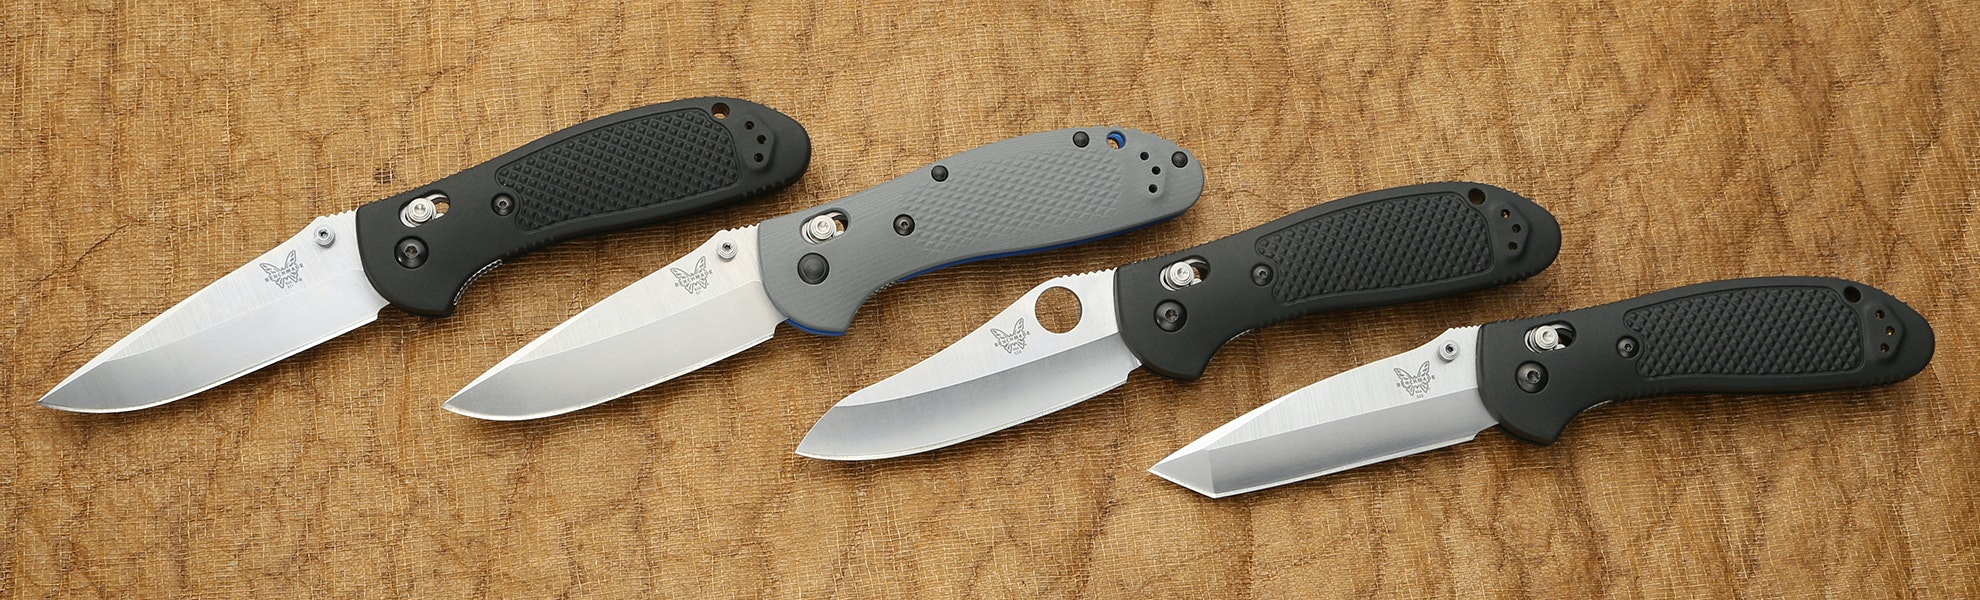 Benchmade Griptilian Folding Knife